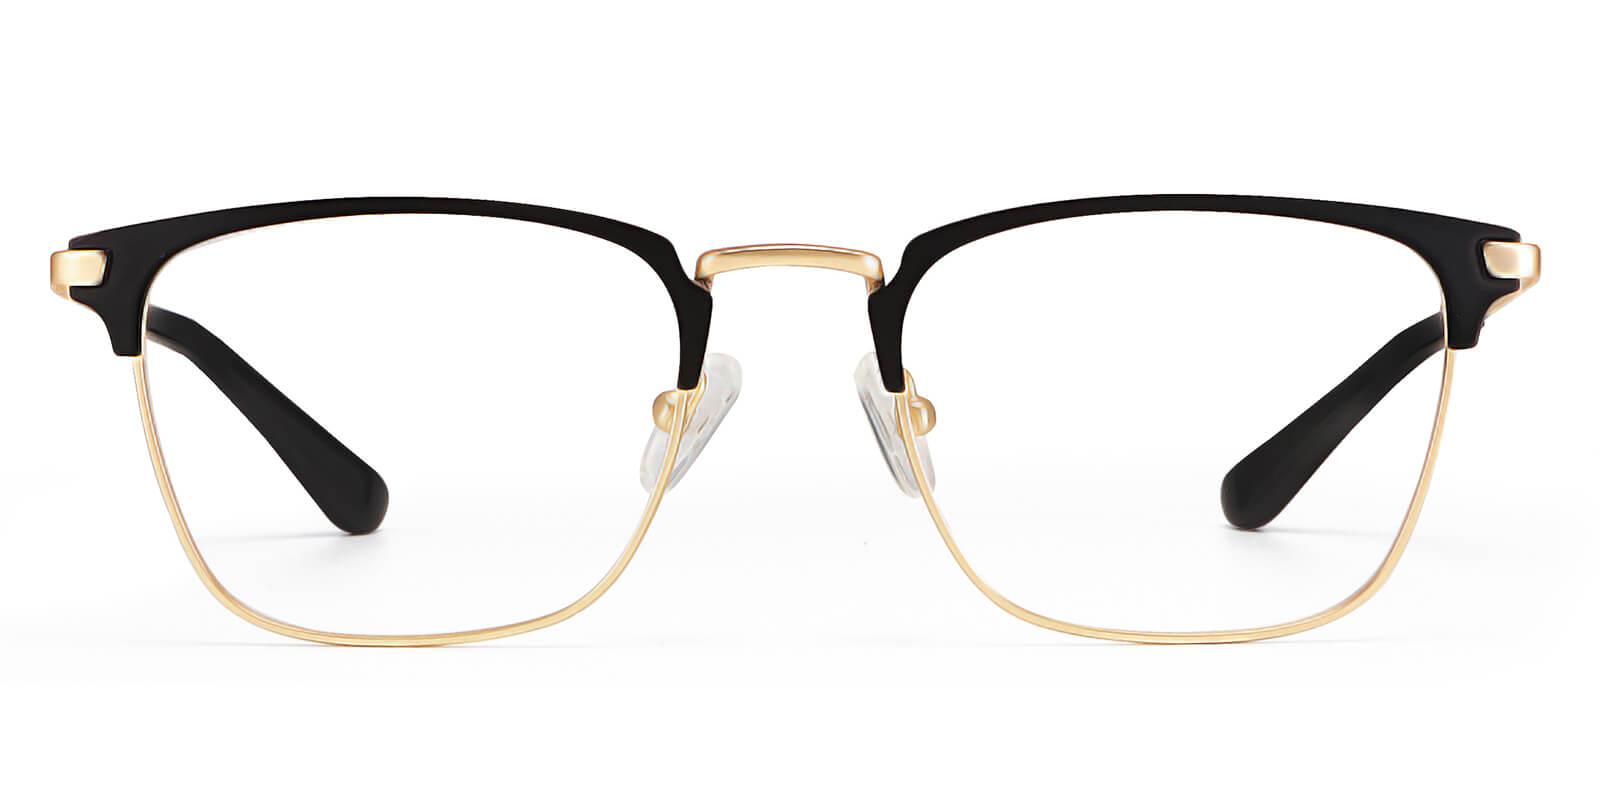 Alliance-Square eyewear with ultra light metal frame